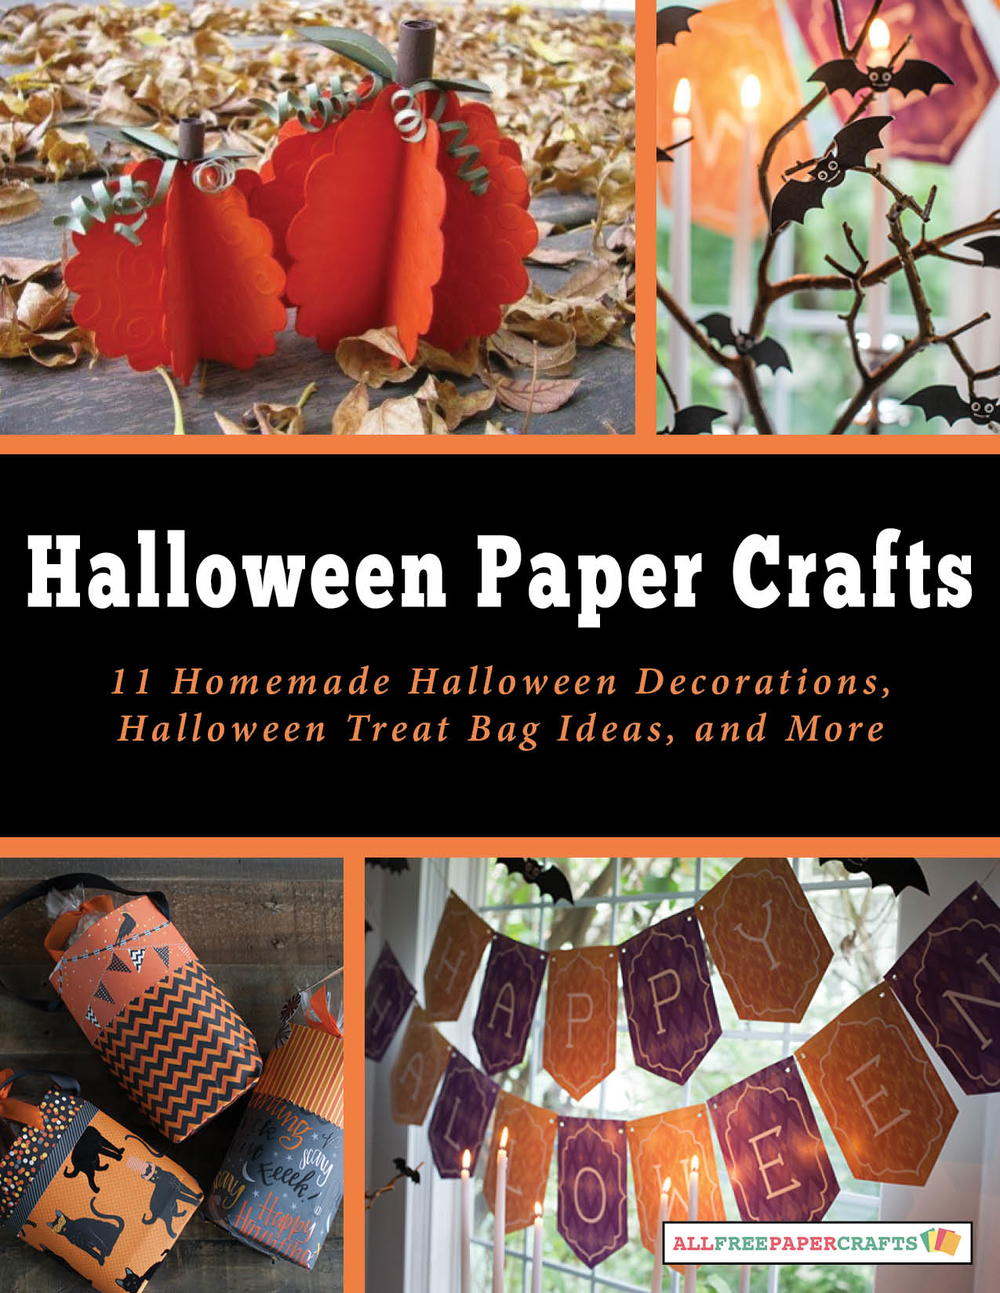 Halloween Paper Crafts 11 Homemade Halloween Decorations